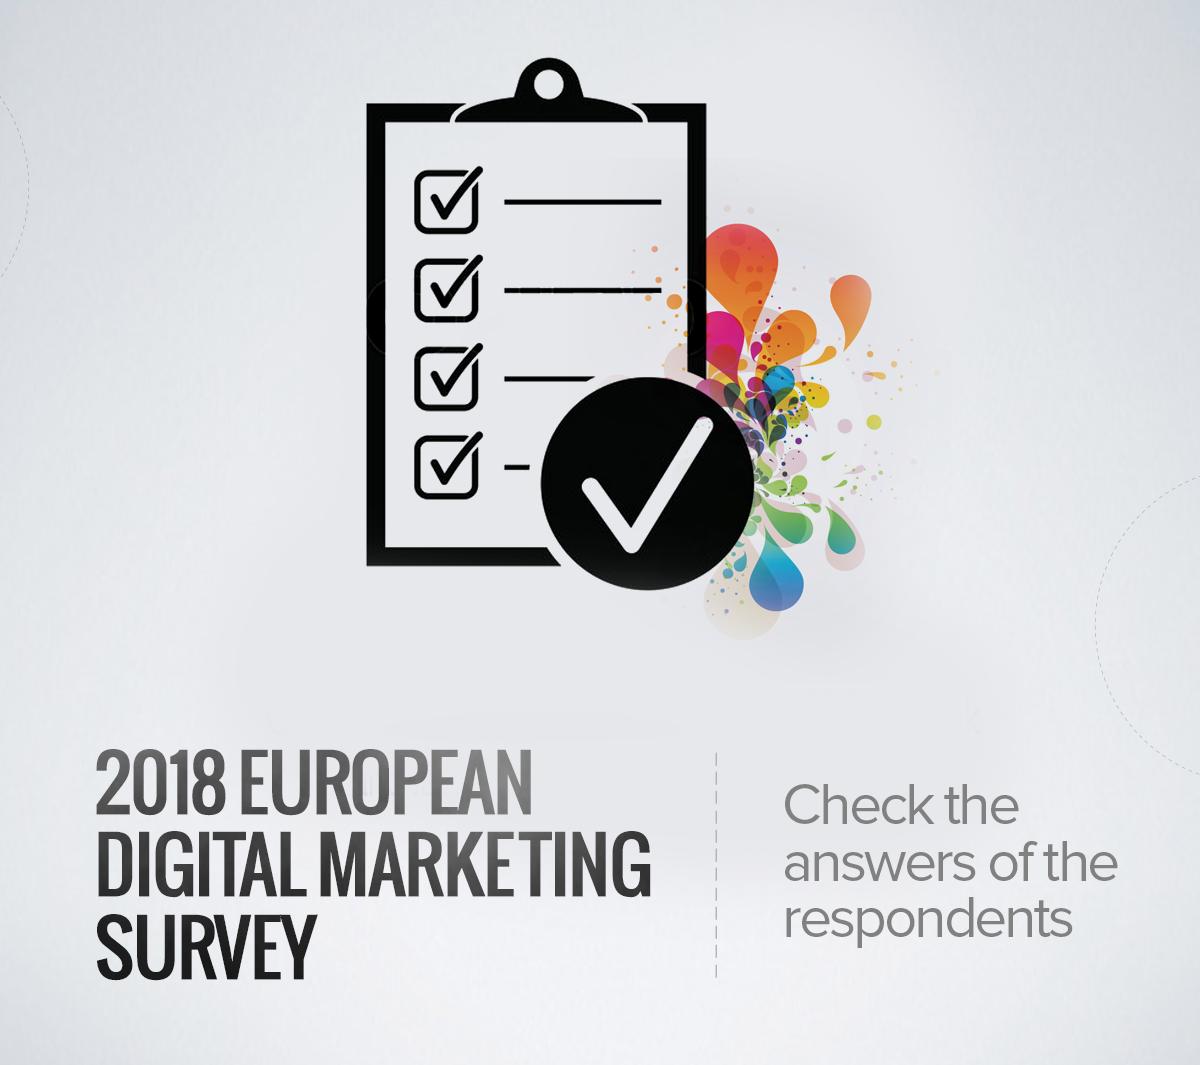 60% of marketers wouldn't go for marketing when choosing a new job (2018 European Digital Marketing Survey)